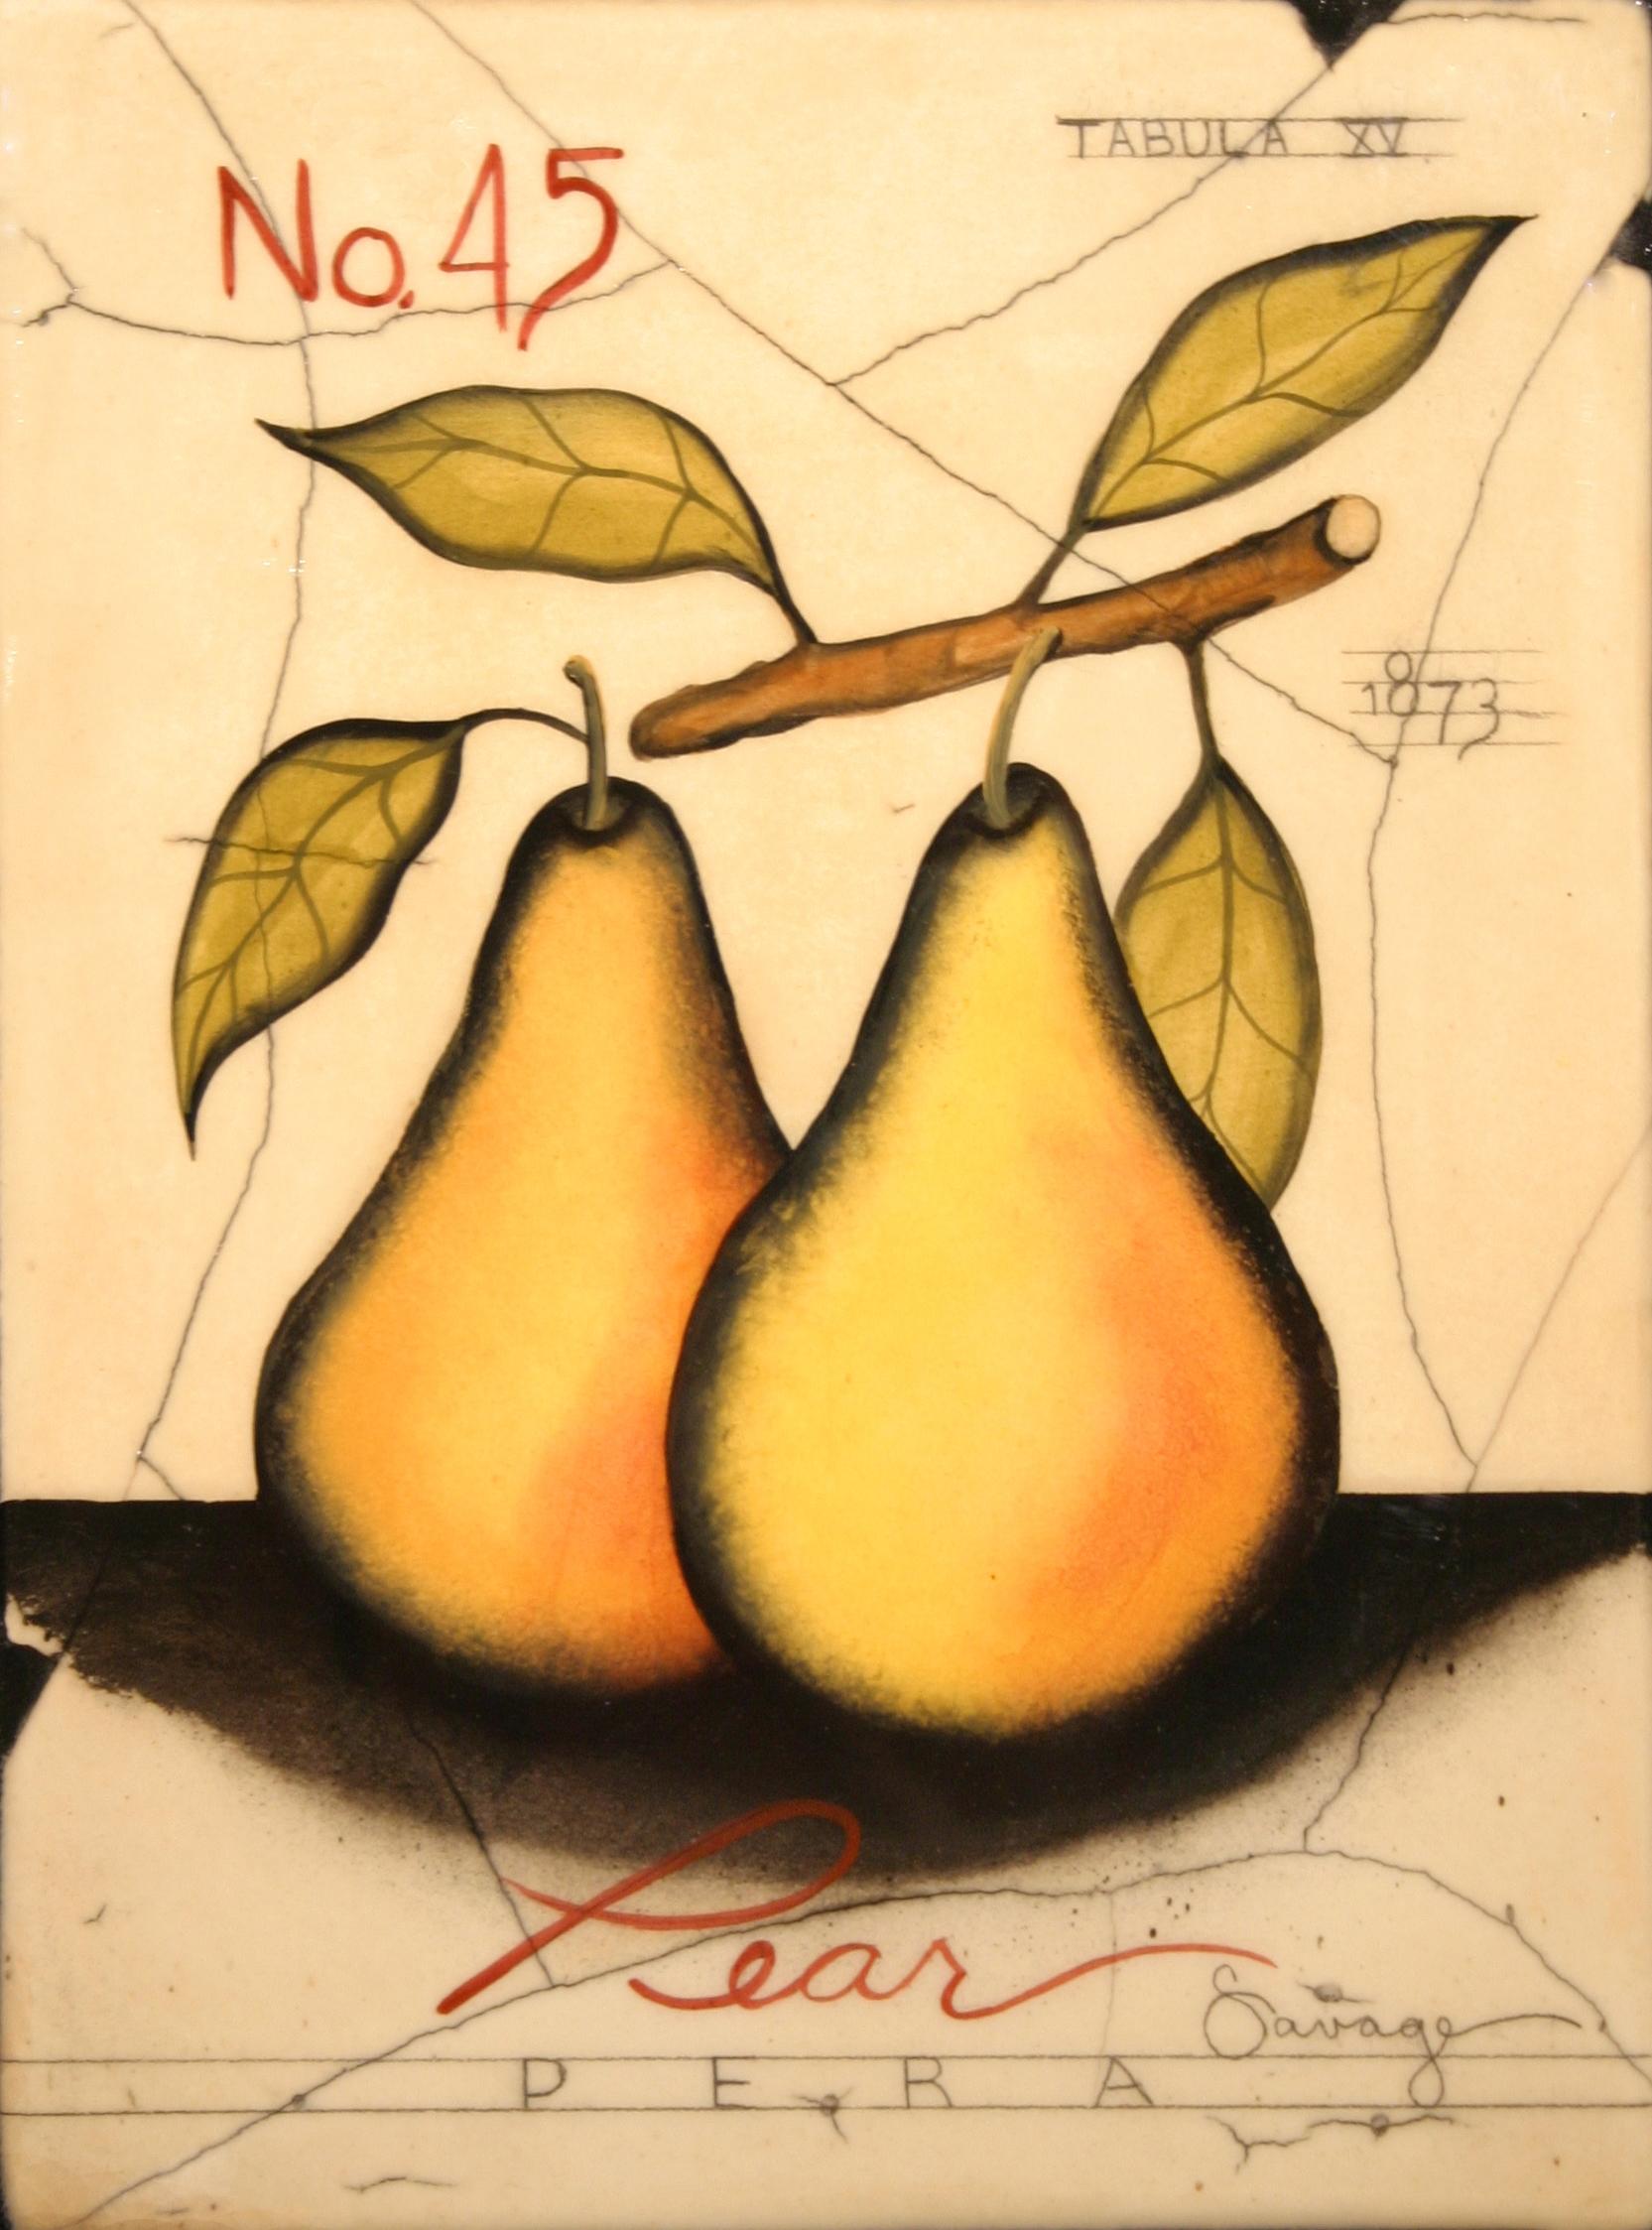 No. 45 Pear